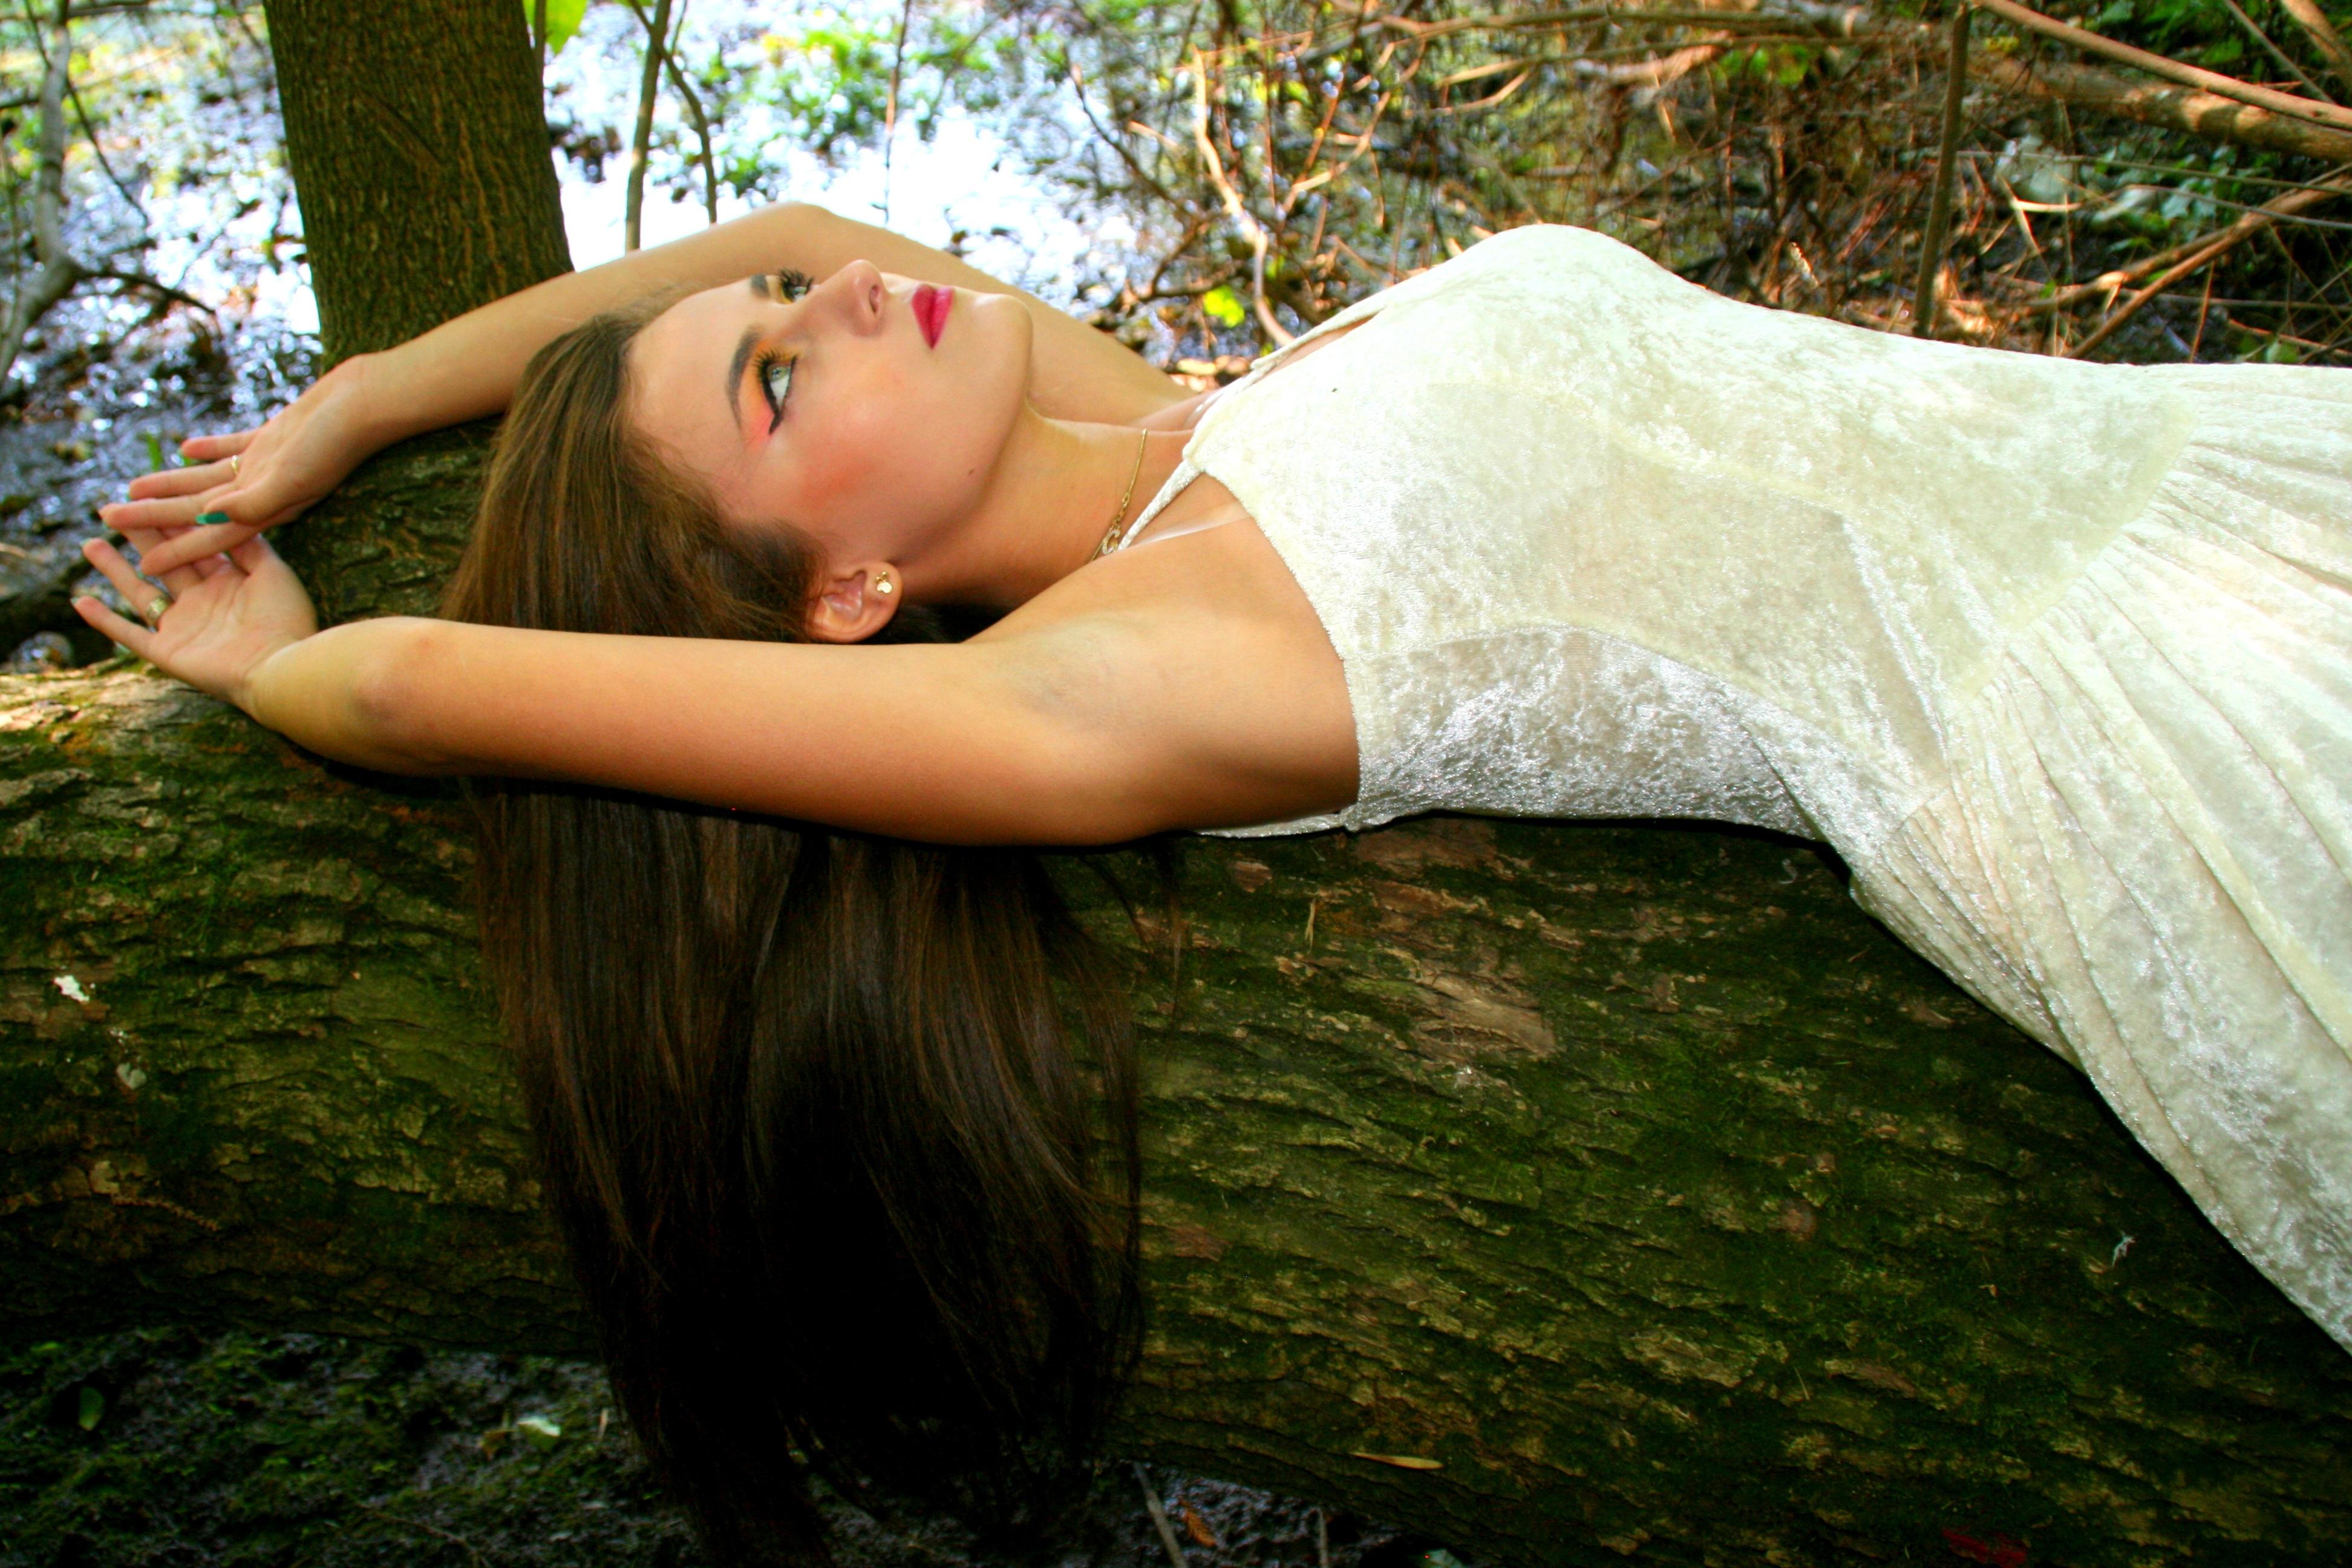 Girl in White, Plants, Tree, Jungle, Human, HQ Photo